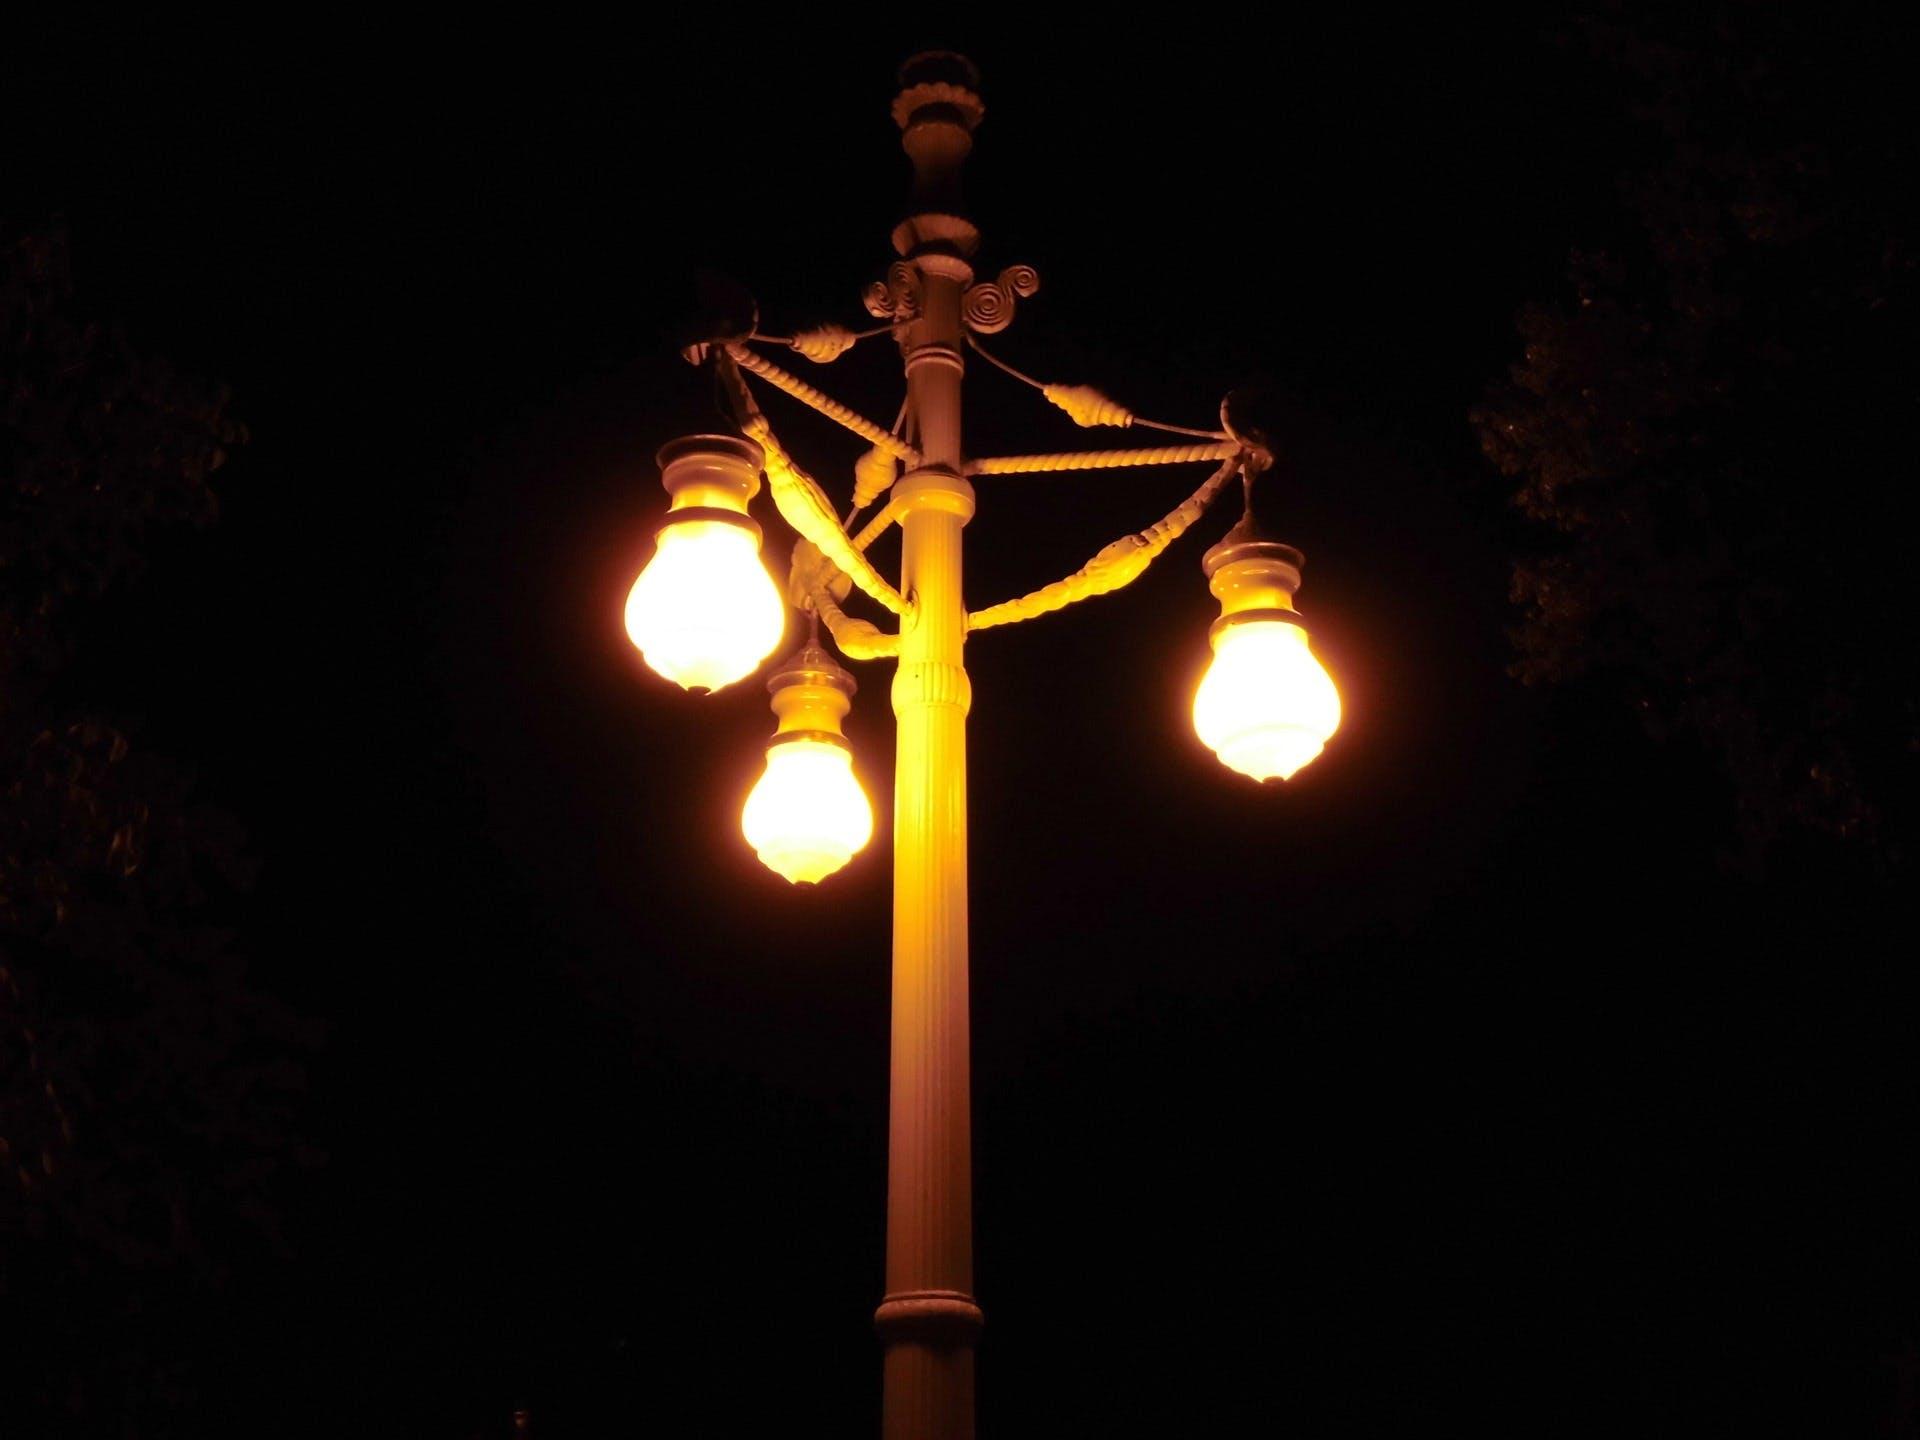 Free stock photo of light, technology, lamp, lighting